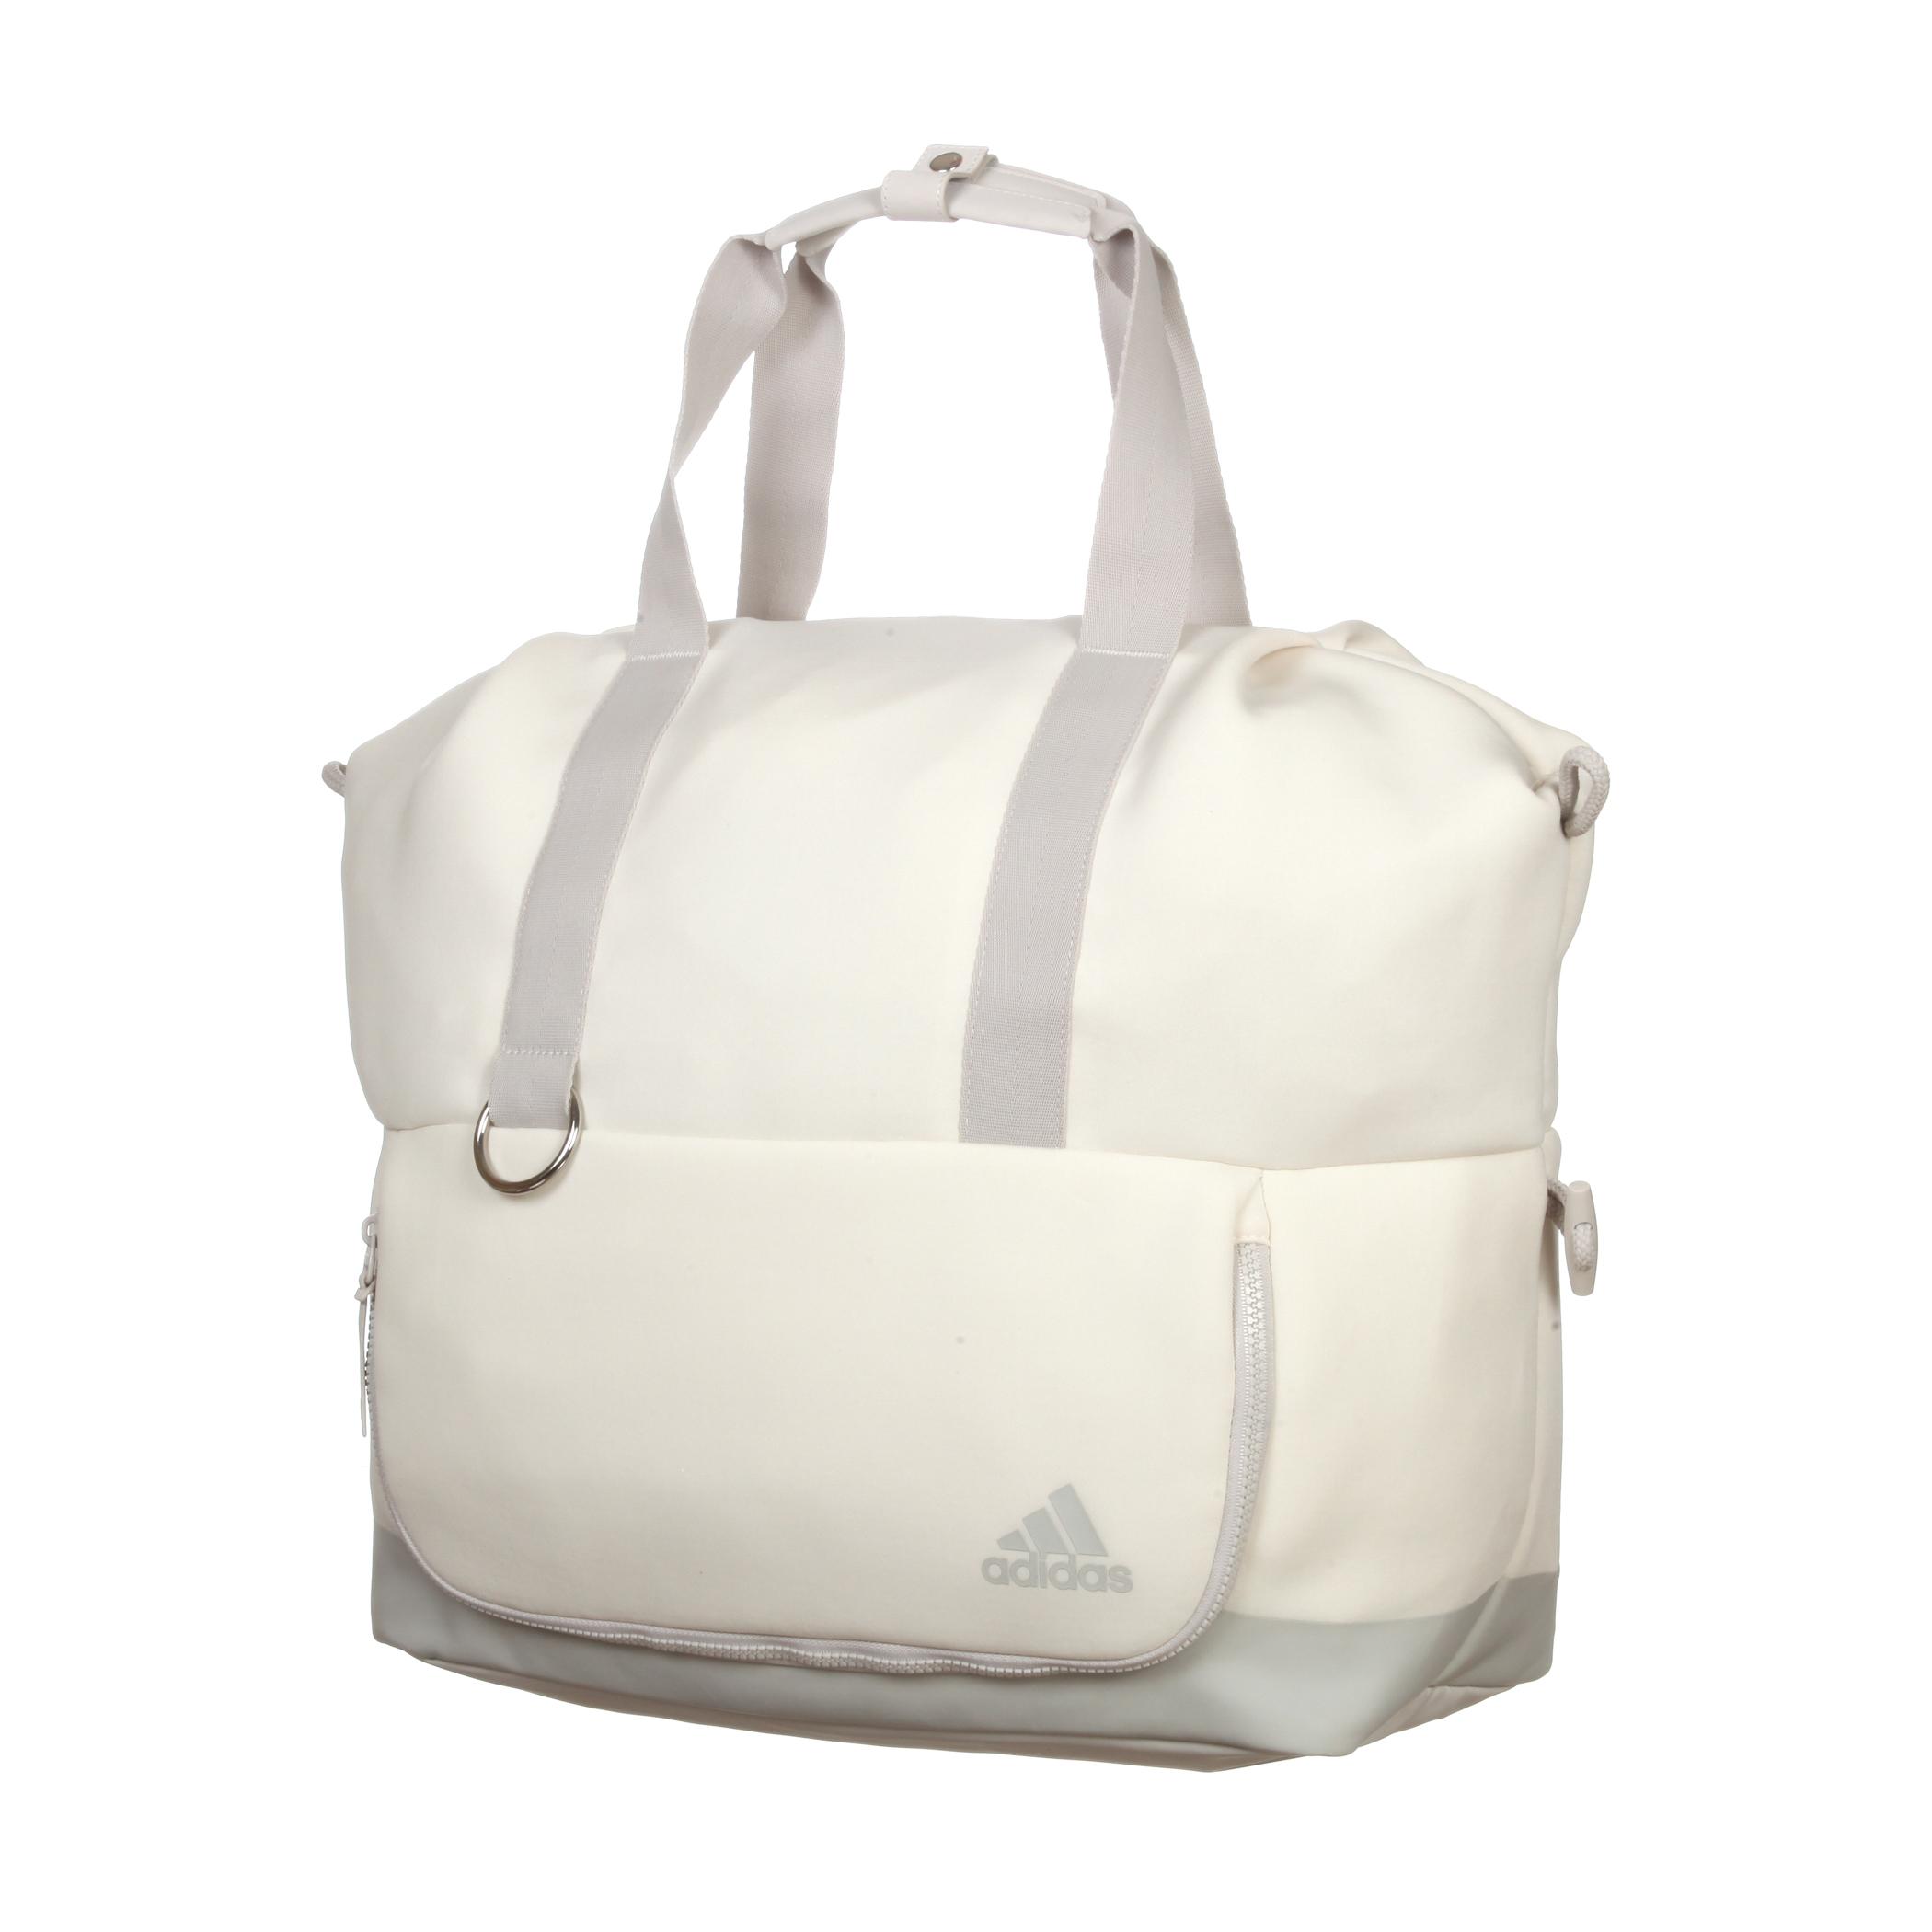 6696787bc136 Женская сумка adidas Performance Favorite Convertible Chalk White/Chalk  Pearl S18 - фото 1